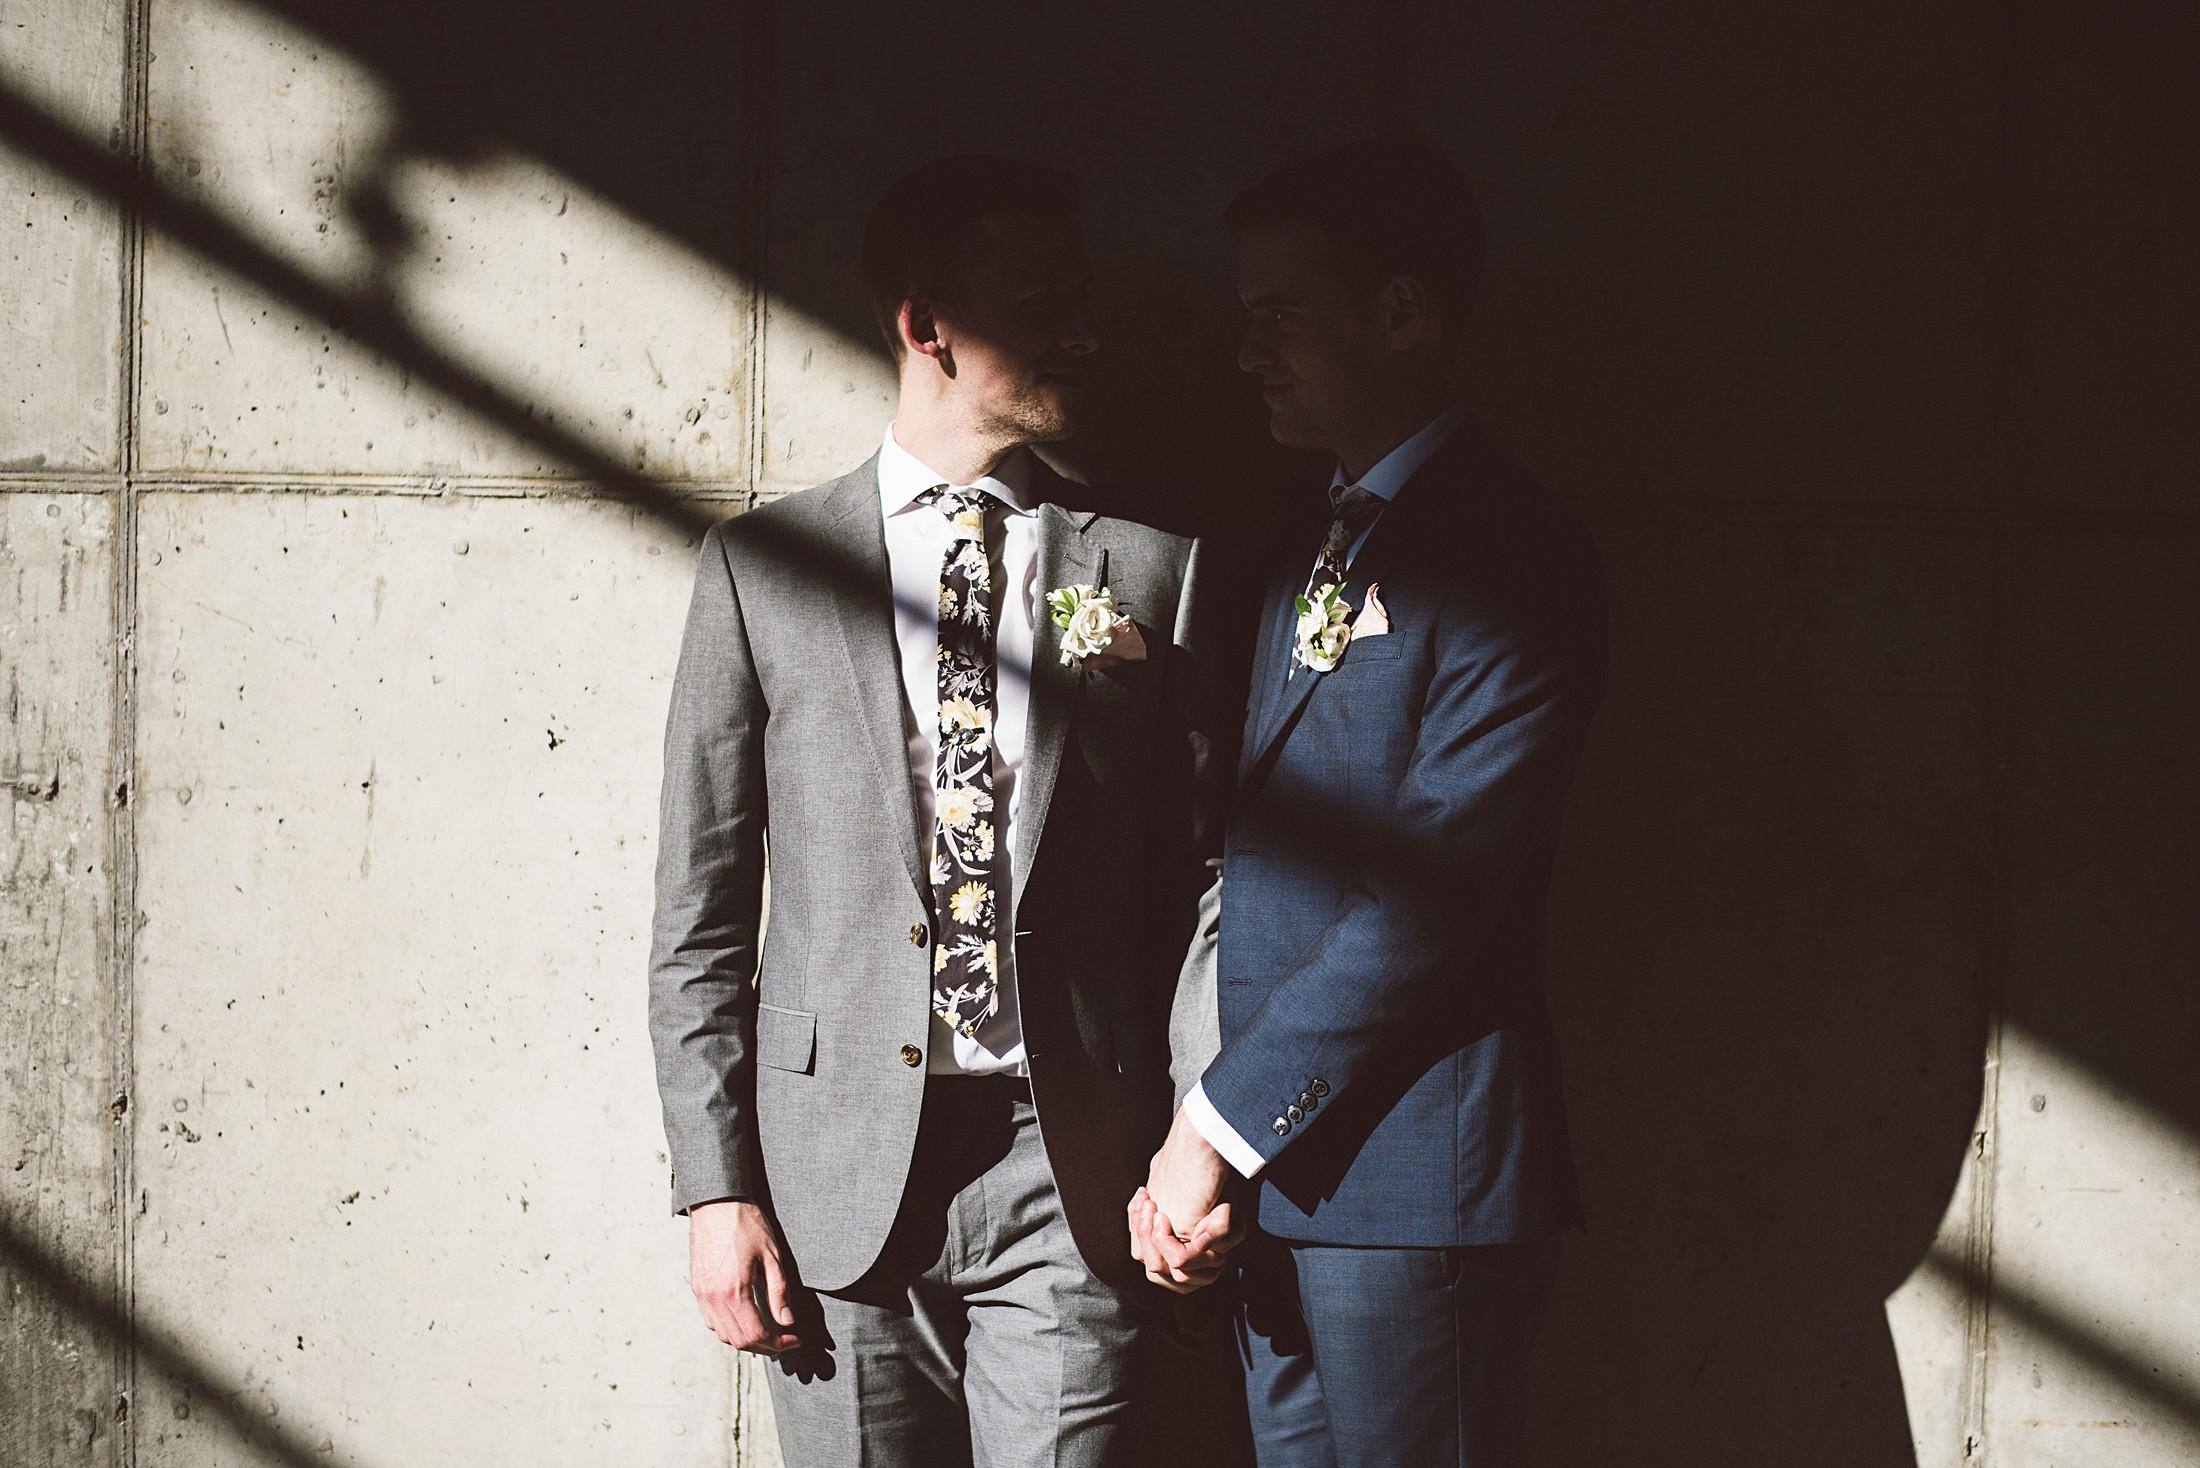 lgbt_wedding_minneapolis_photo_by_lucas_botz_photography_2018-01-04_0008.jpg